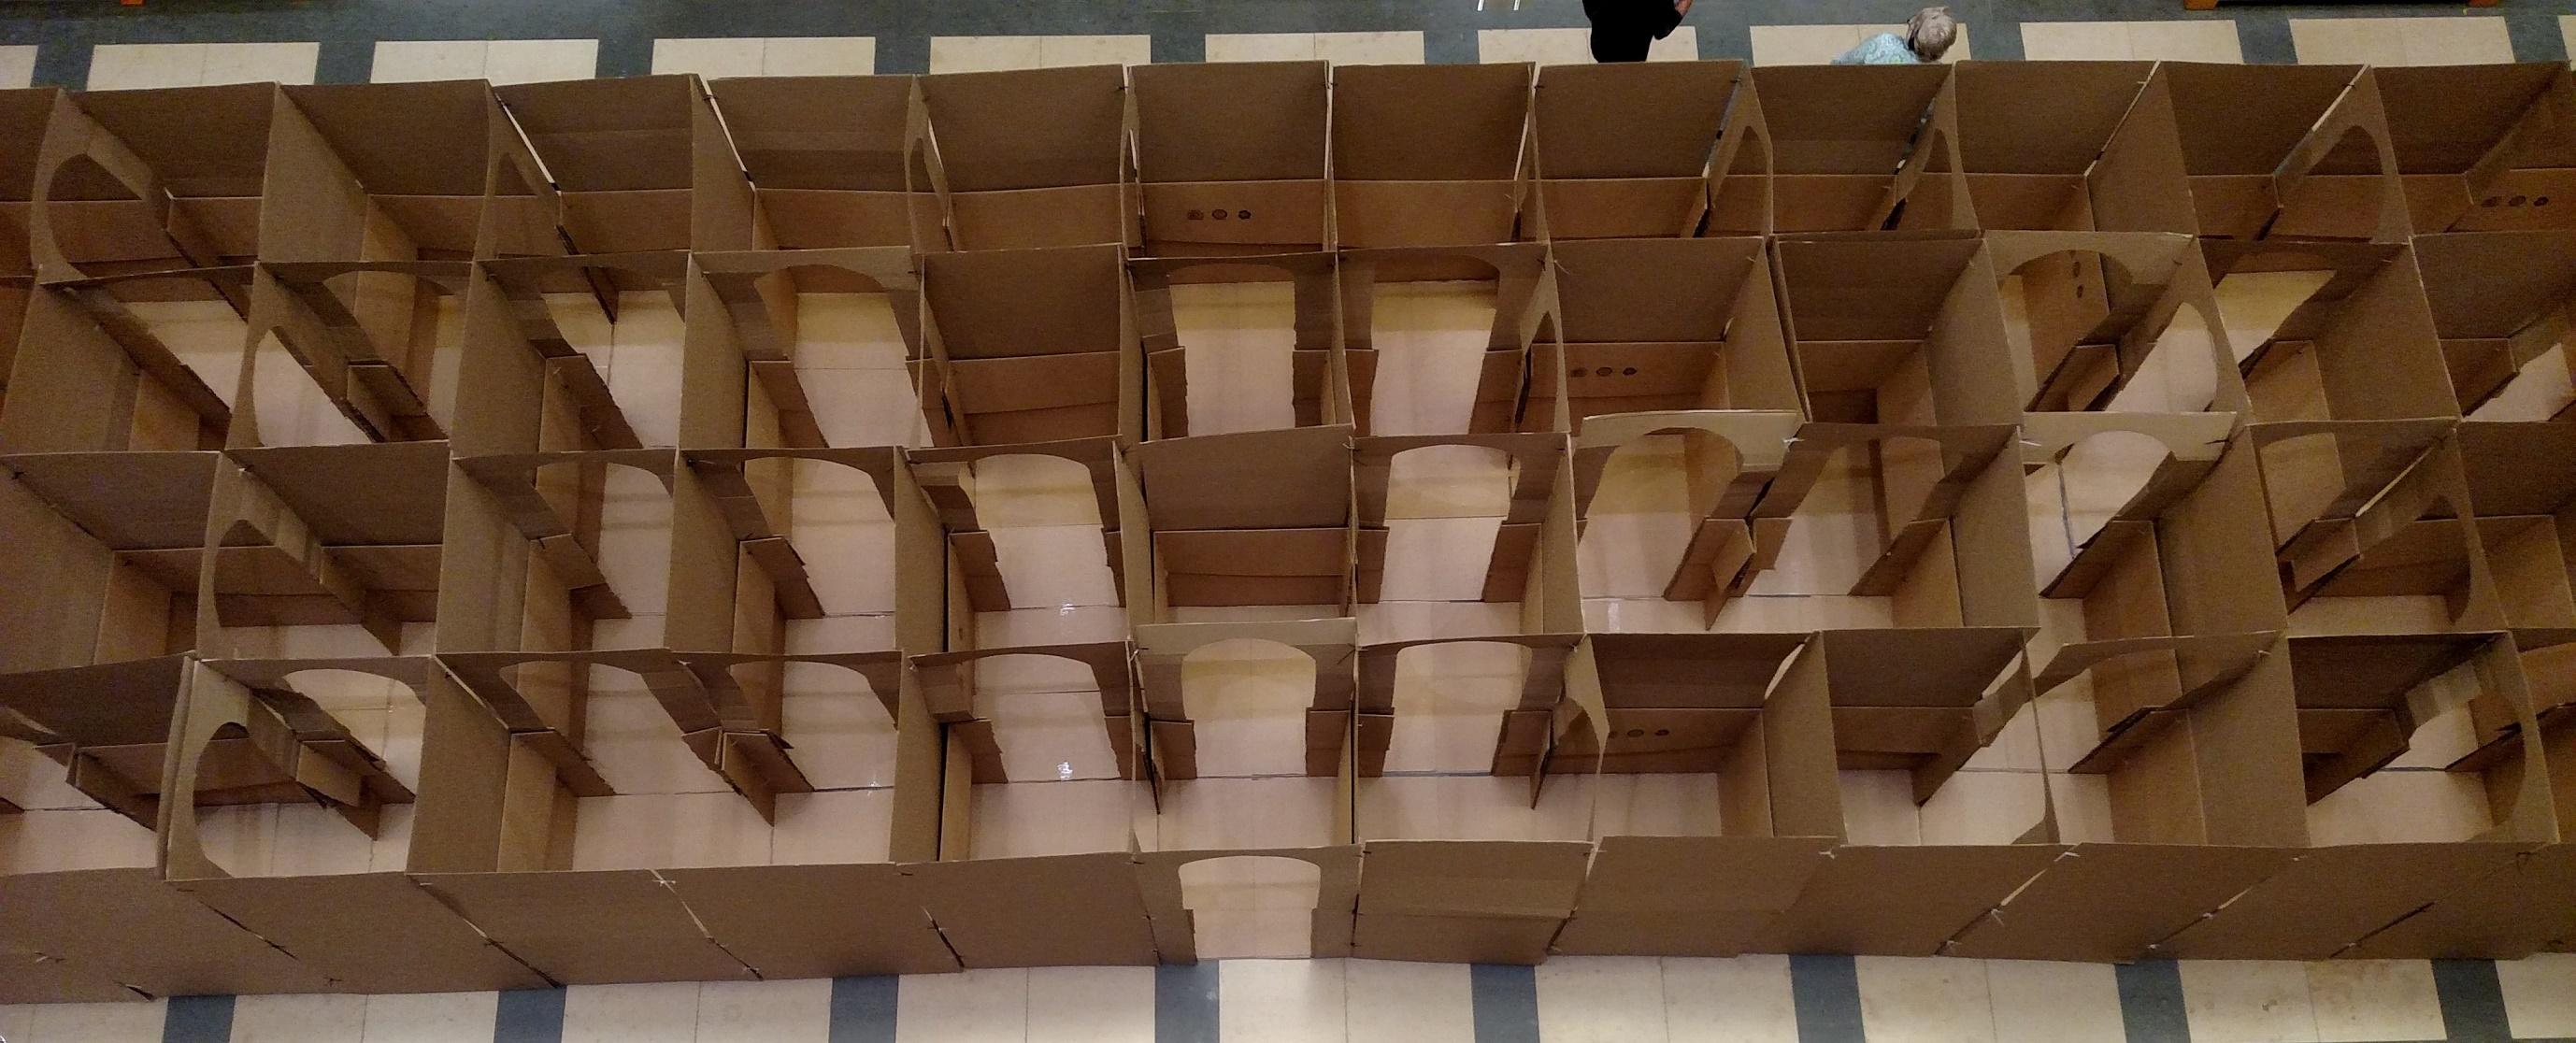 An A-Maze-ing Library Experience - ALSC Blog